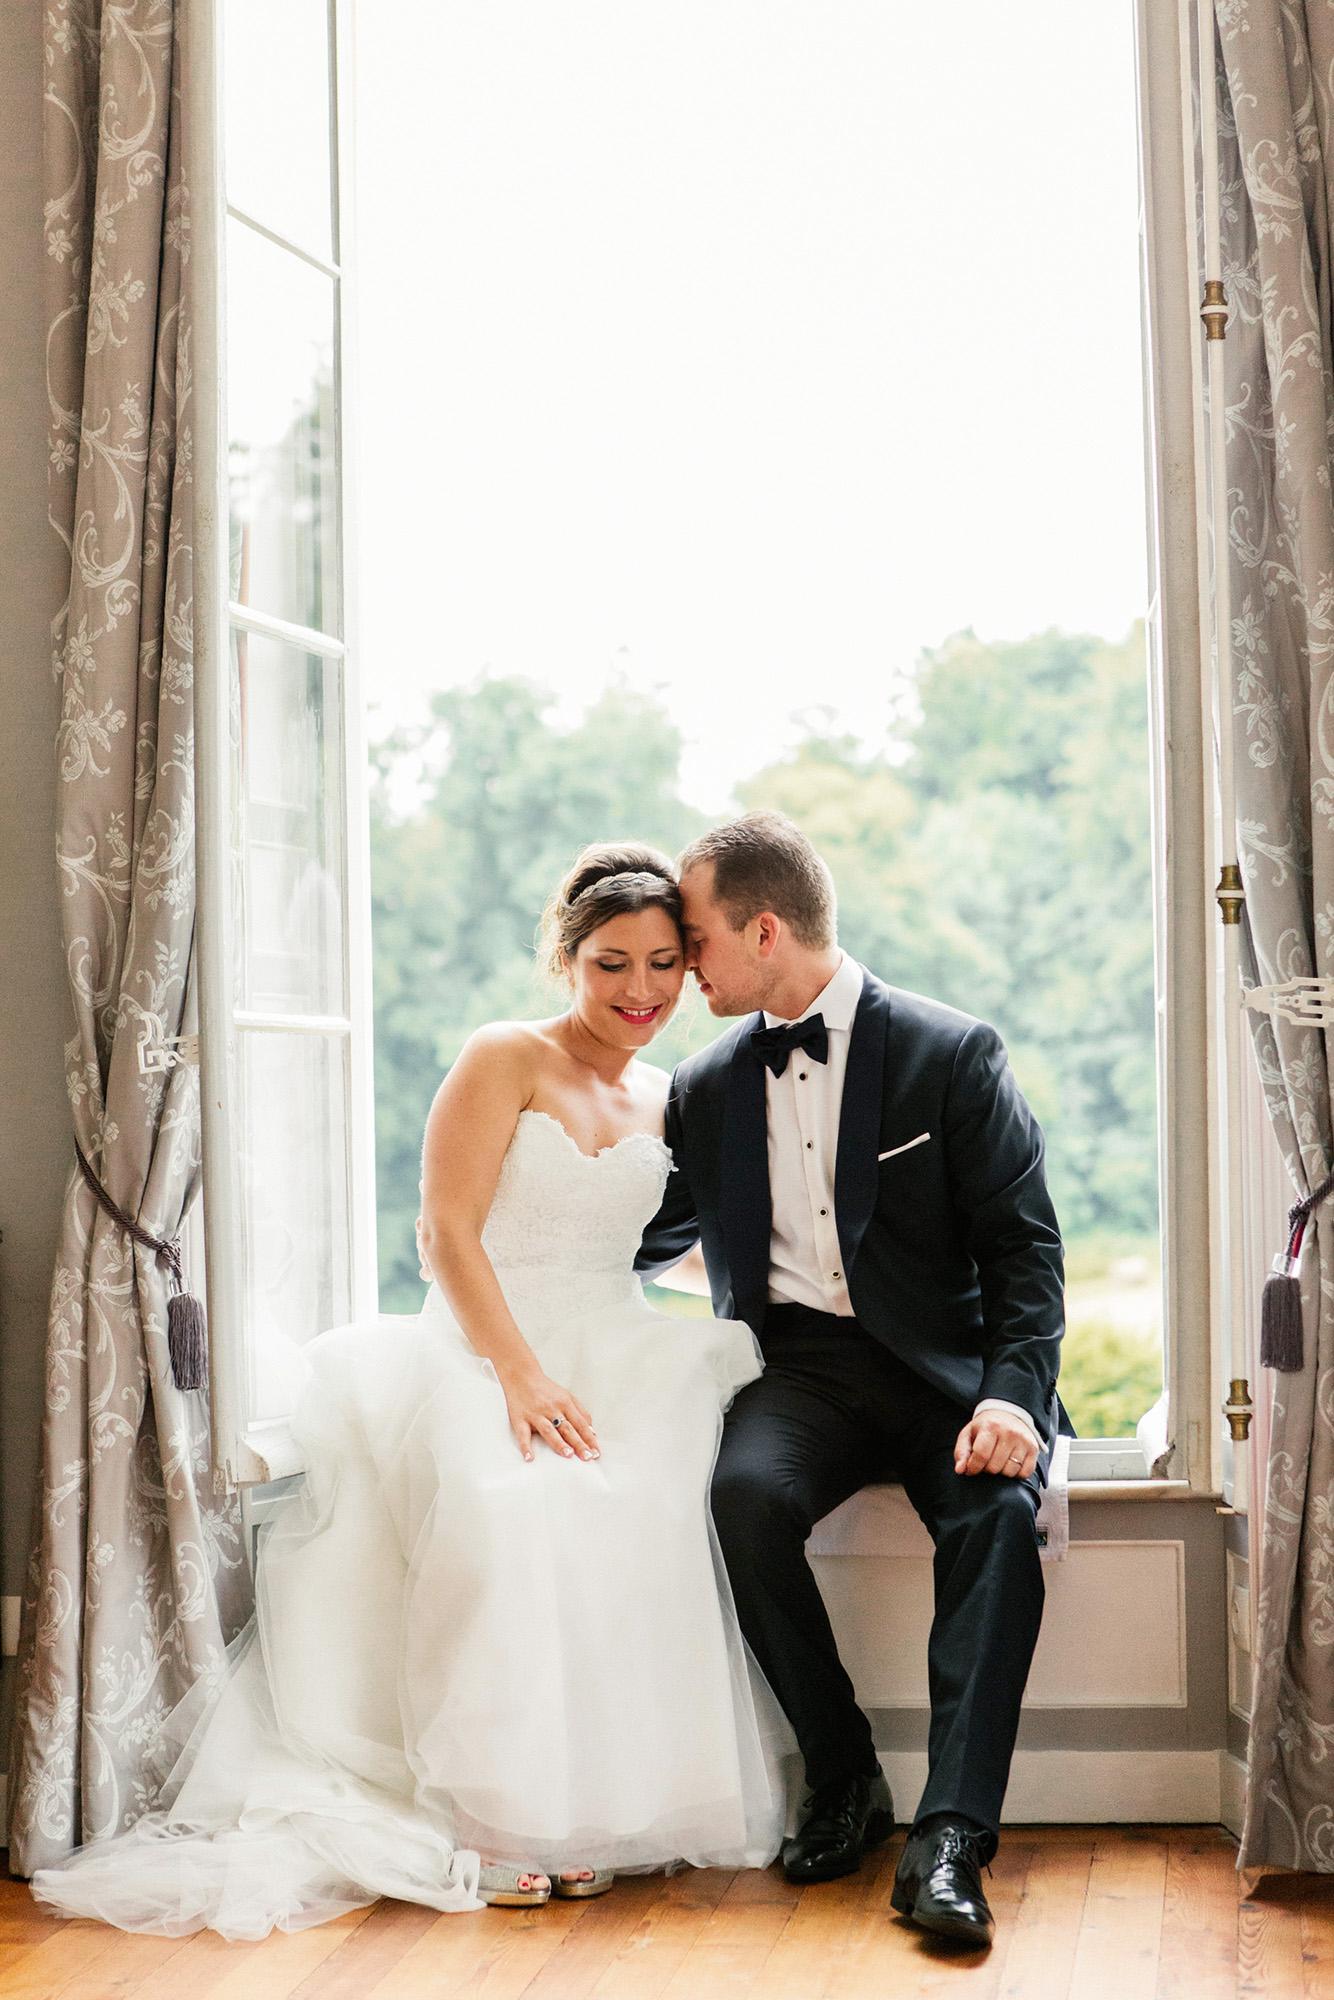 photographe-mariage-toulouse-31